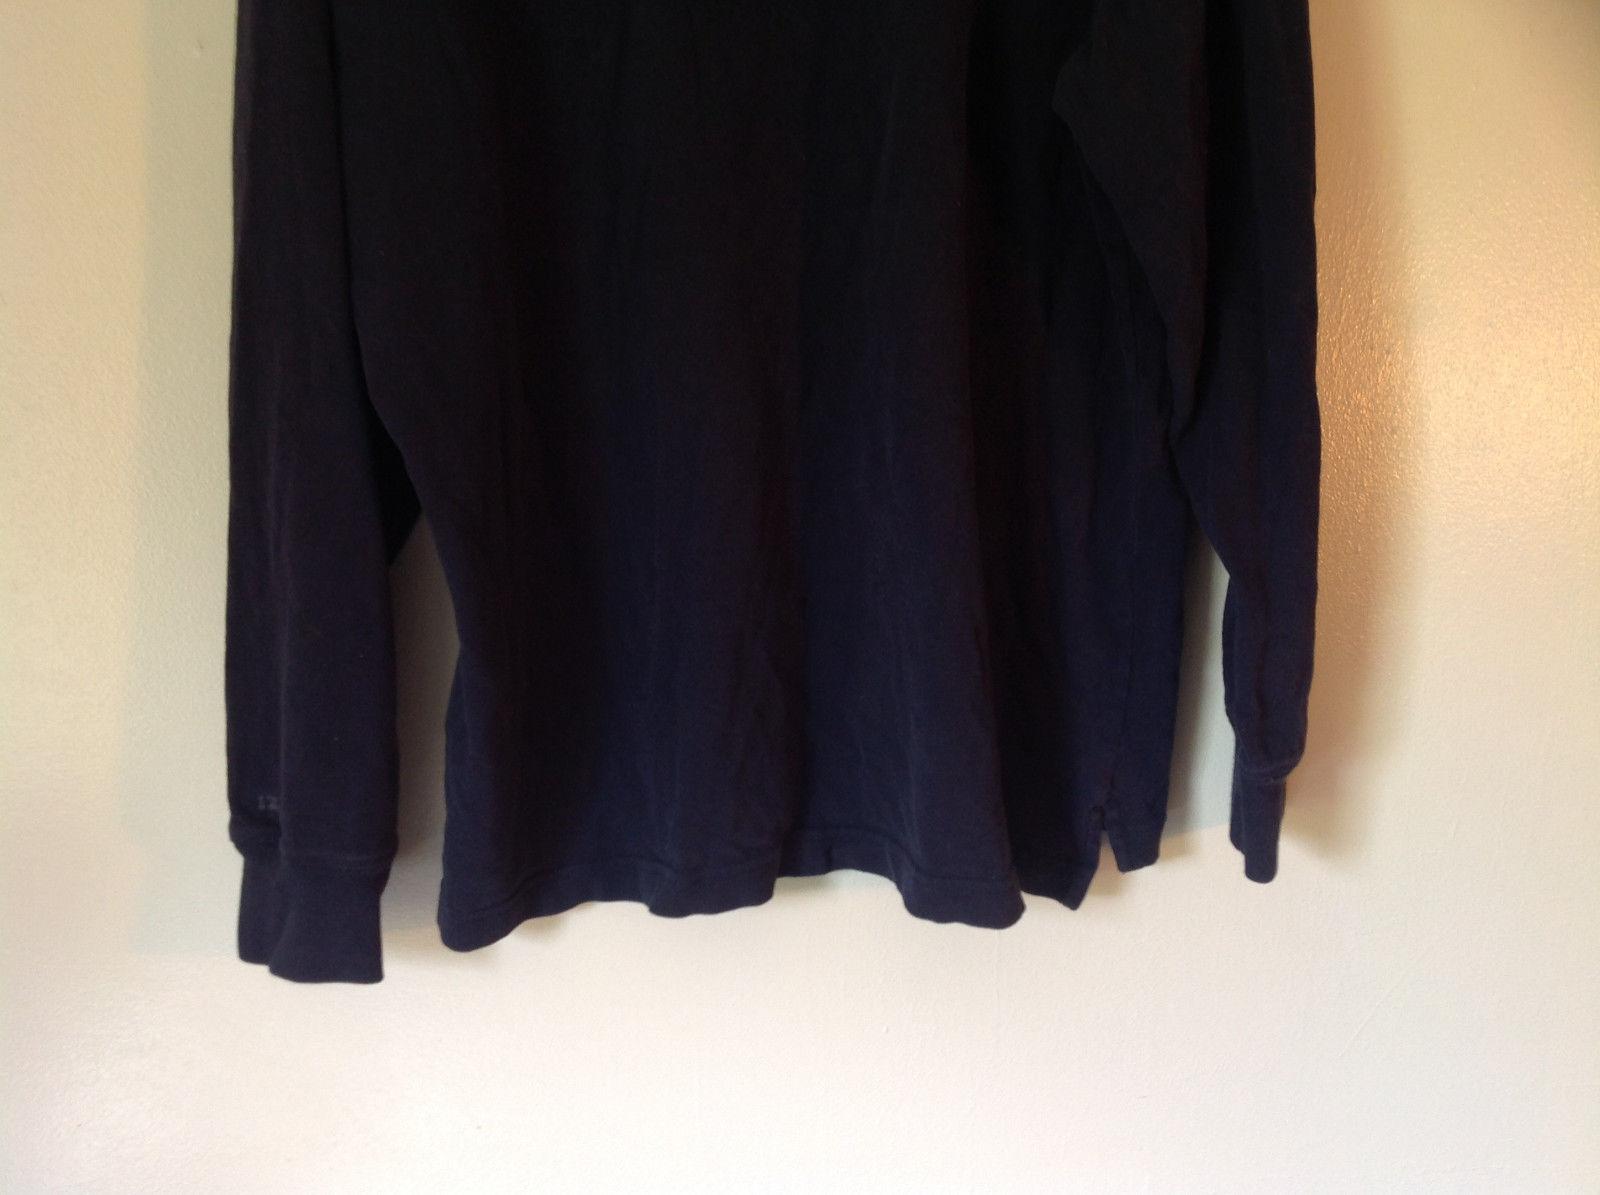 Dark Blue Long Sleeve 100 Percent Cotton Izod Shirt Made In Vietnam Size Large